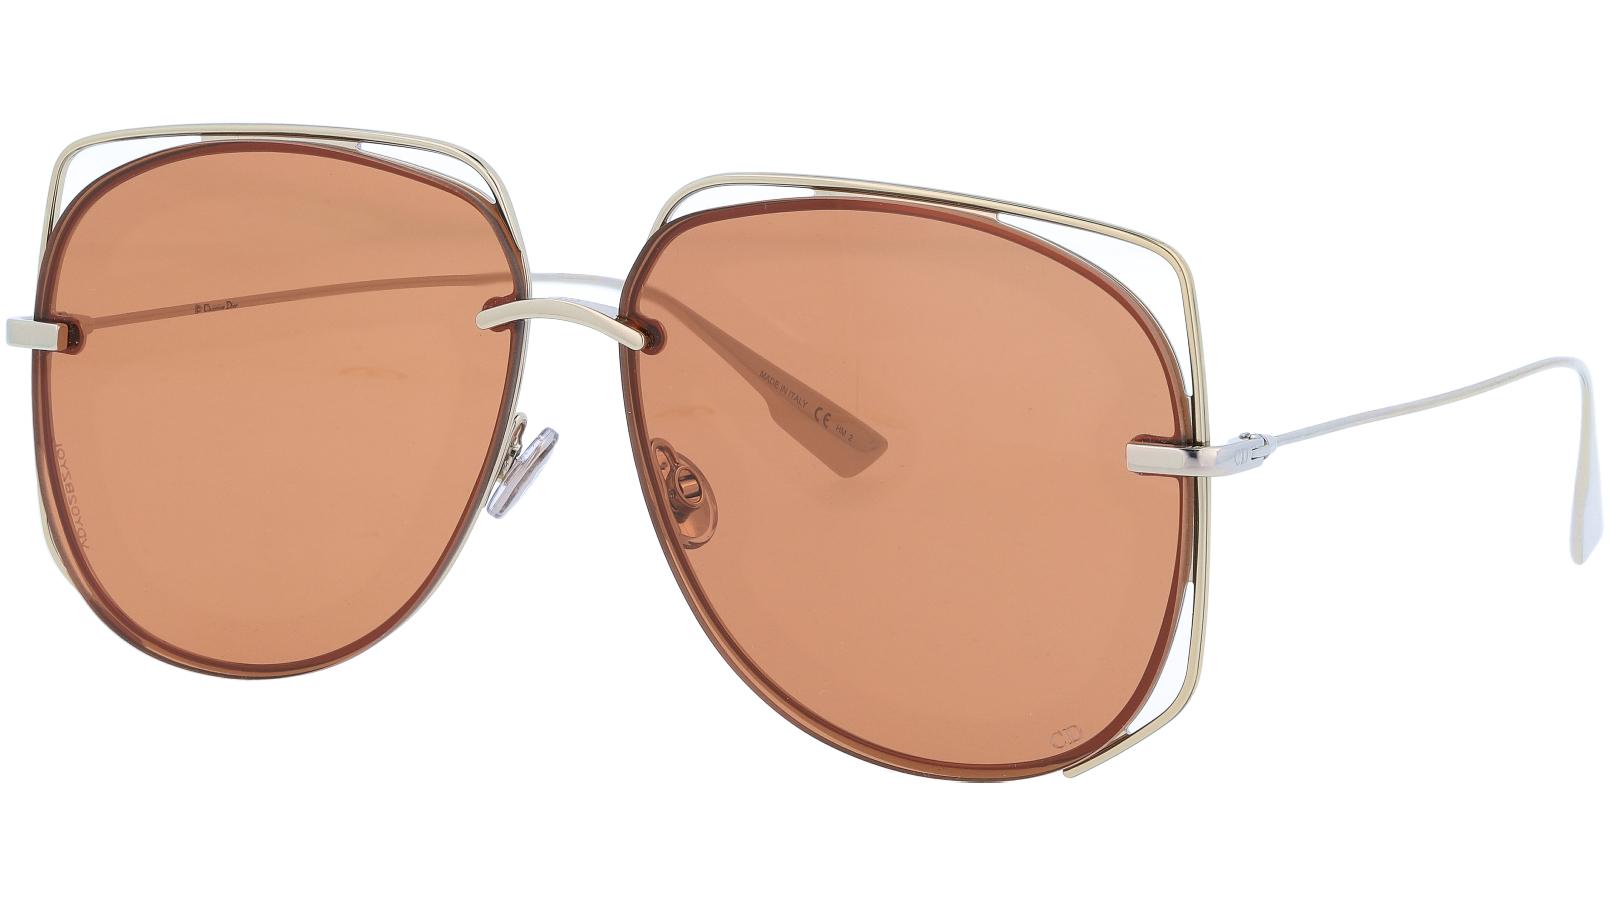 DIOR DIORSTELLAIRE6 3YG2M 61 LIGHT Sunglasses